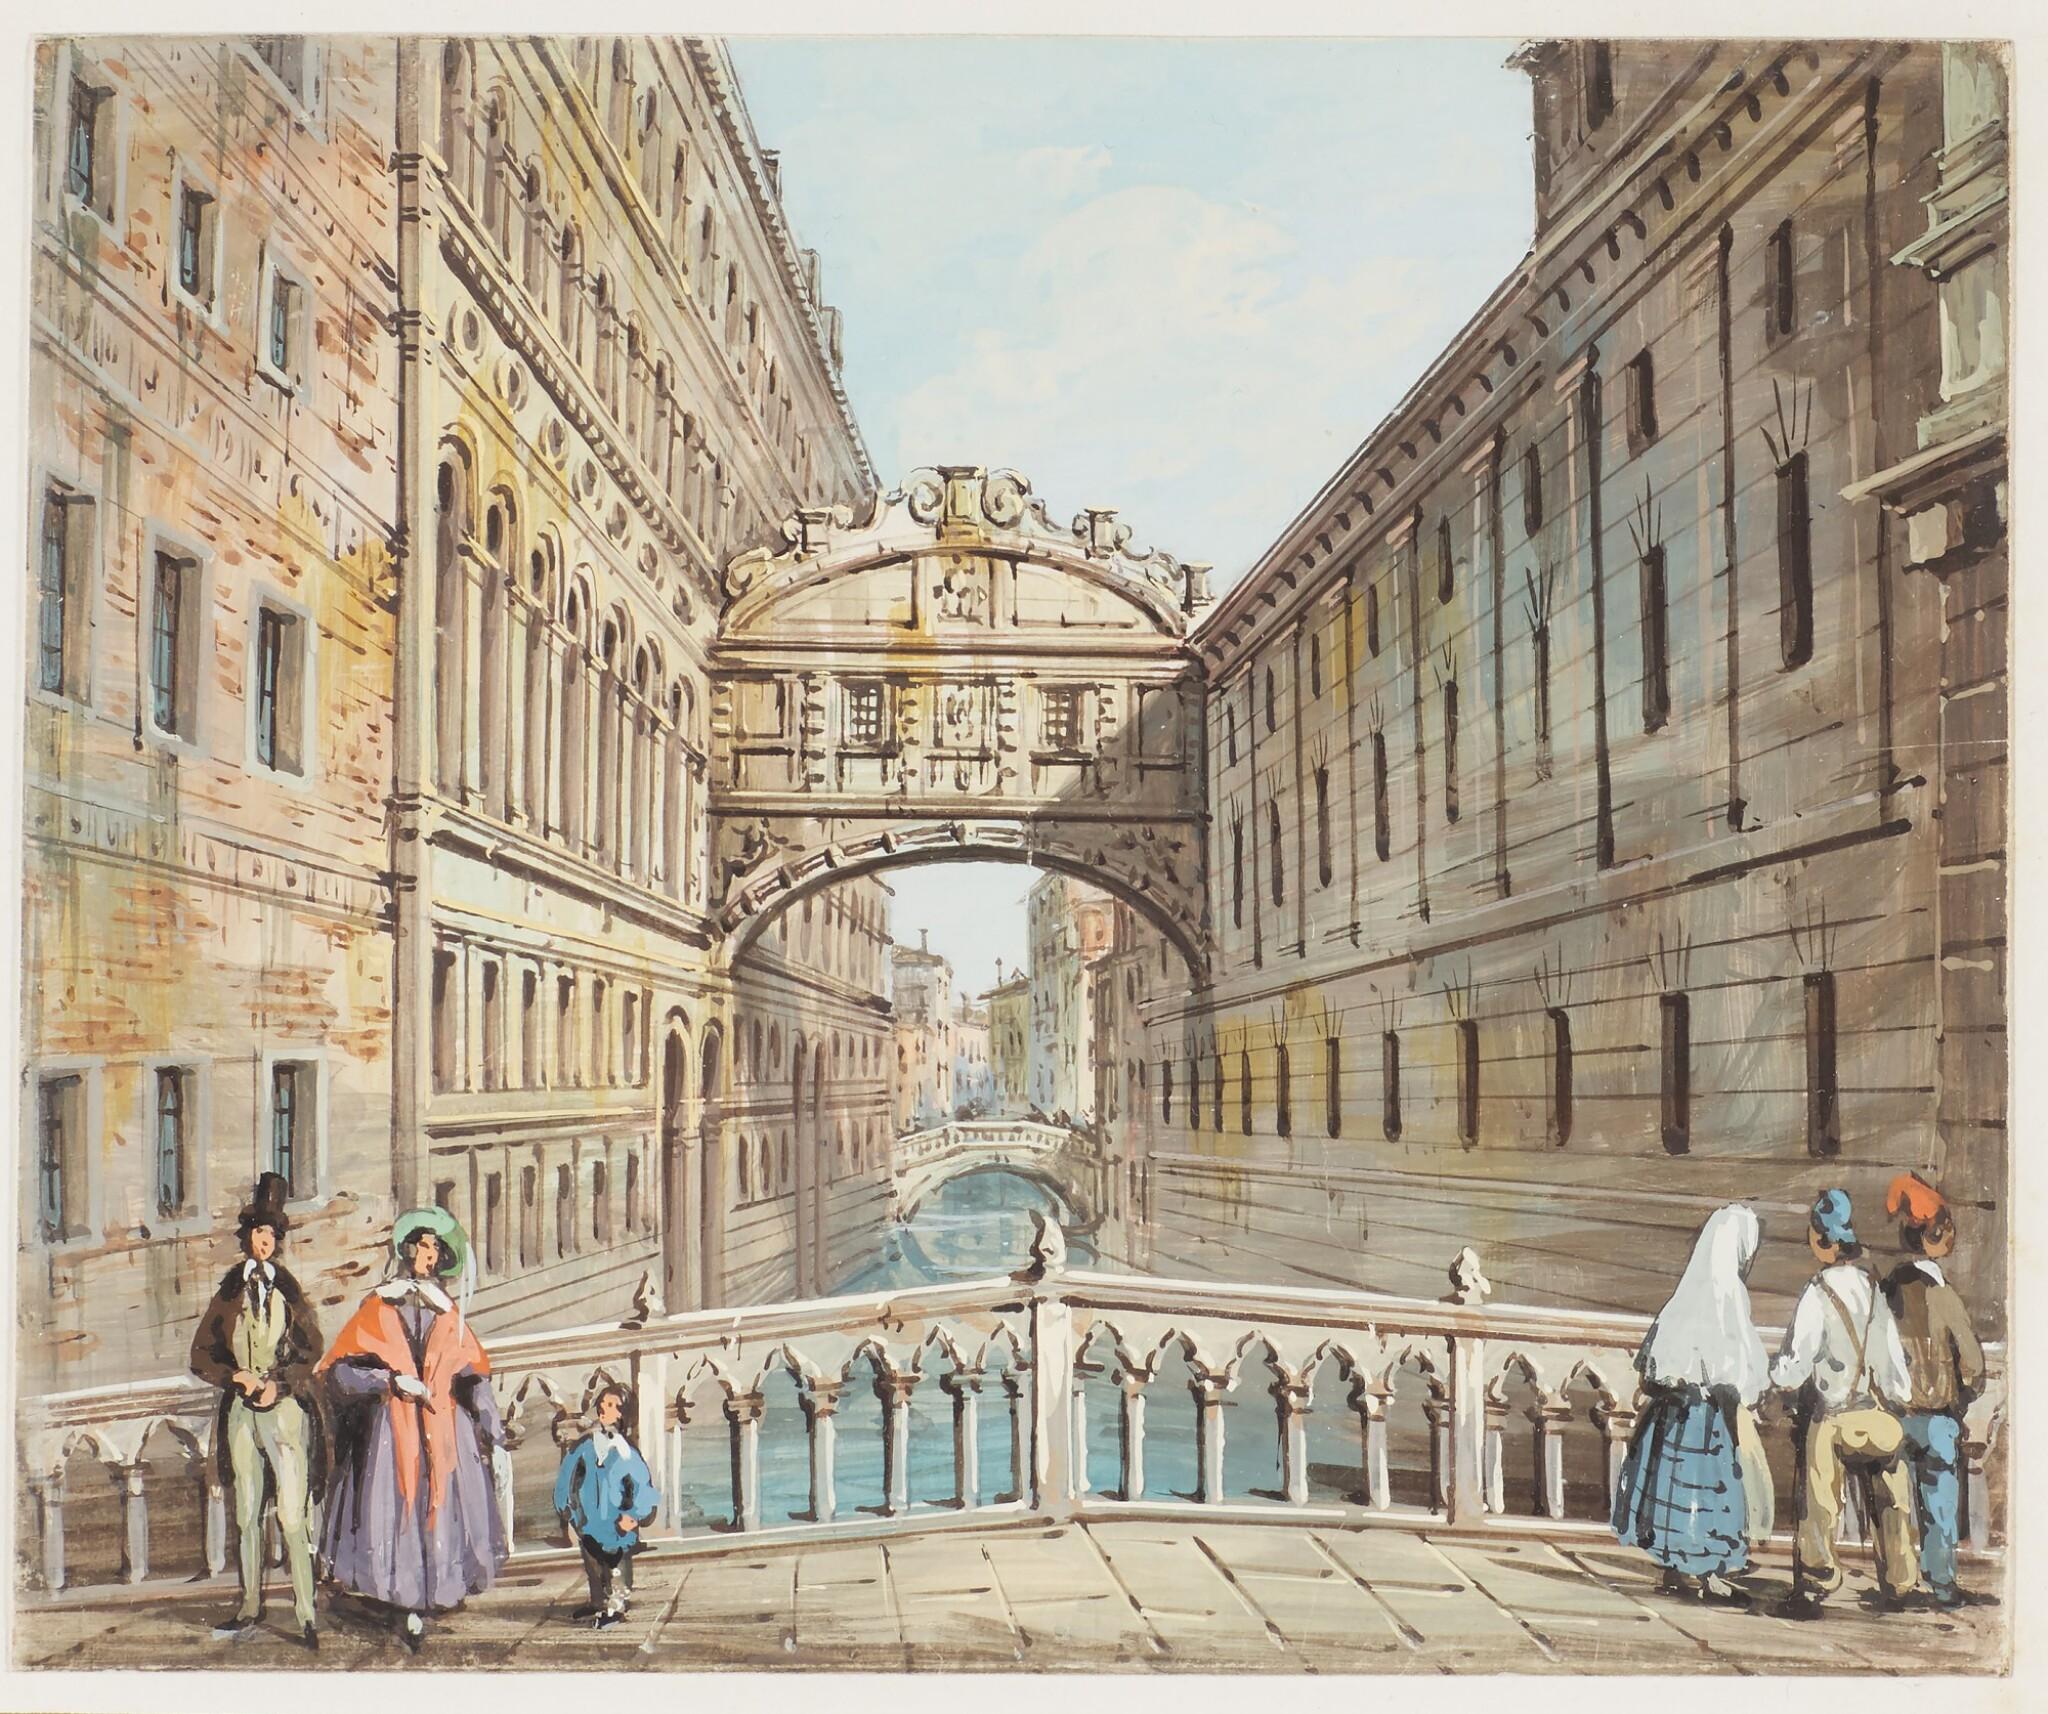 CARLO GRUBACS | View of thePonte dei Sospiri, Venice